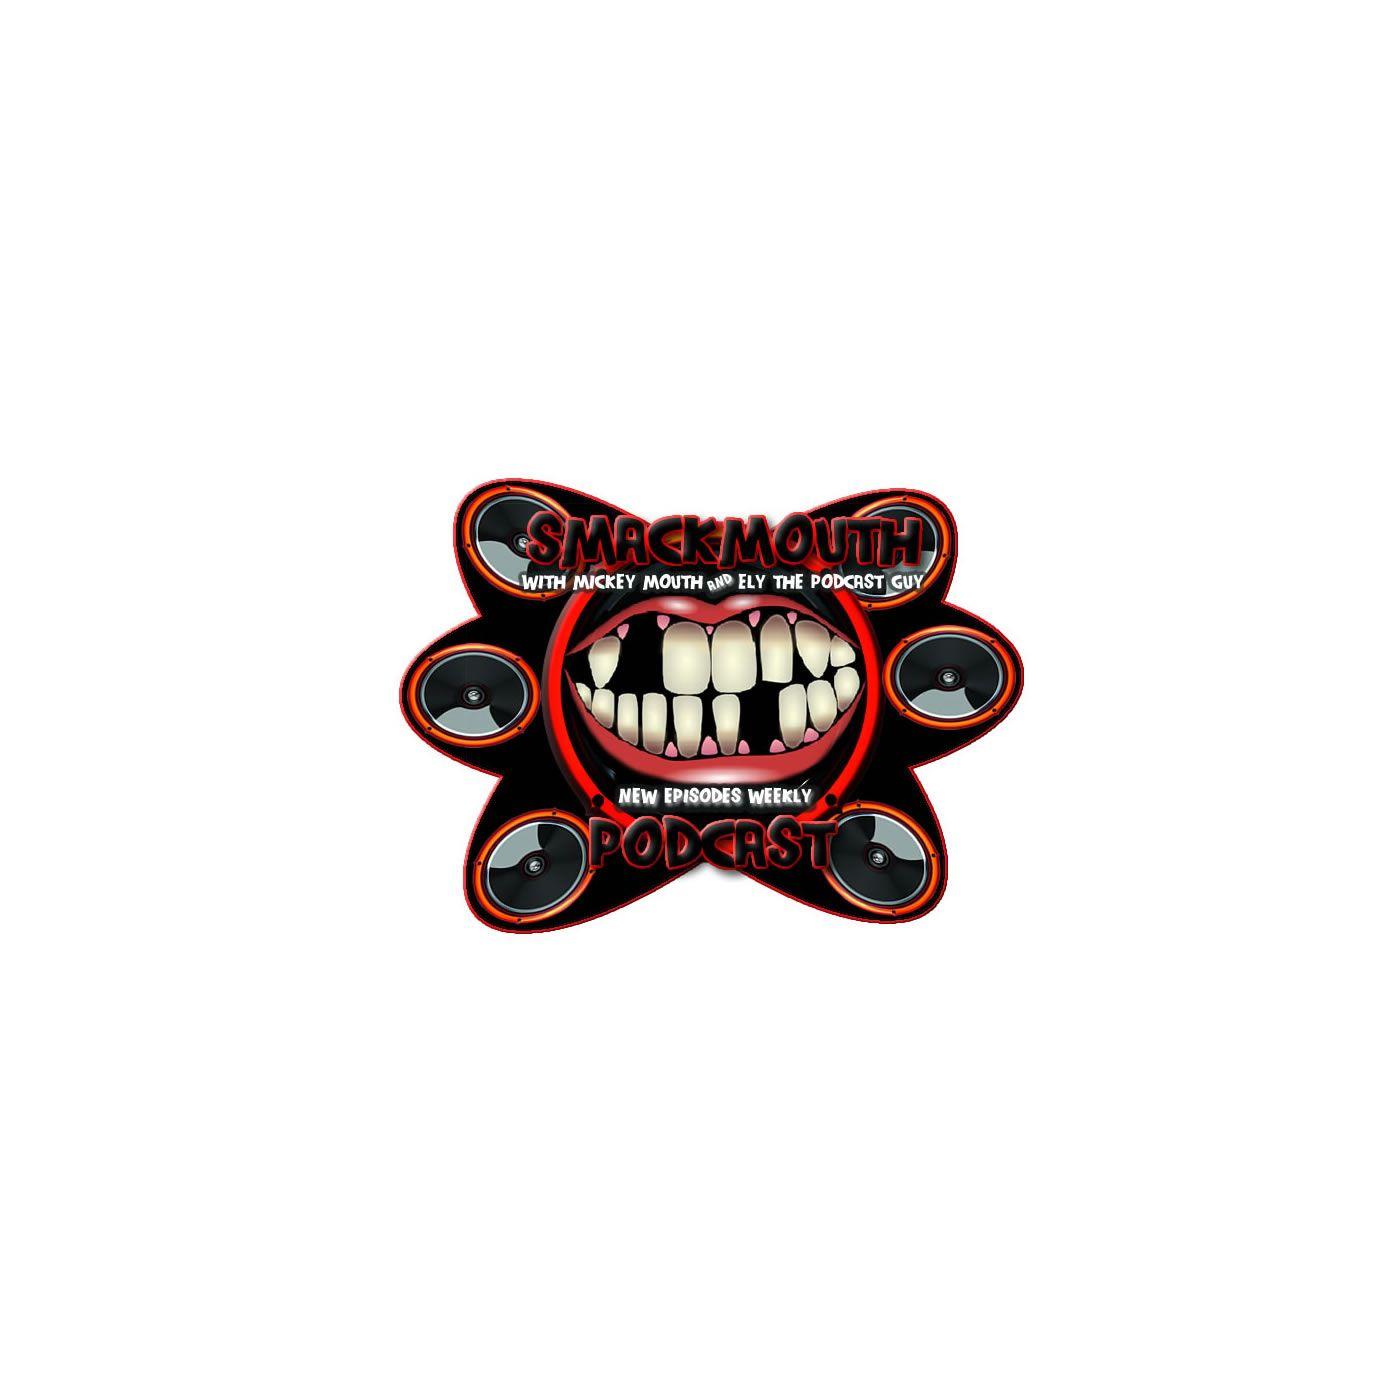 Smackmouth Podcast